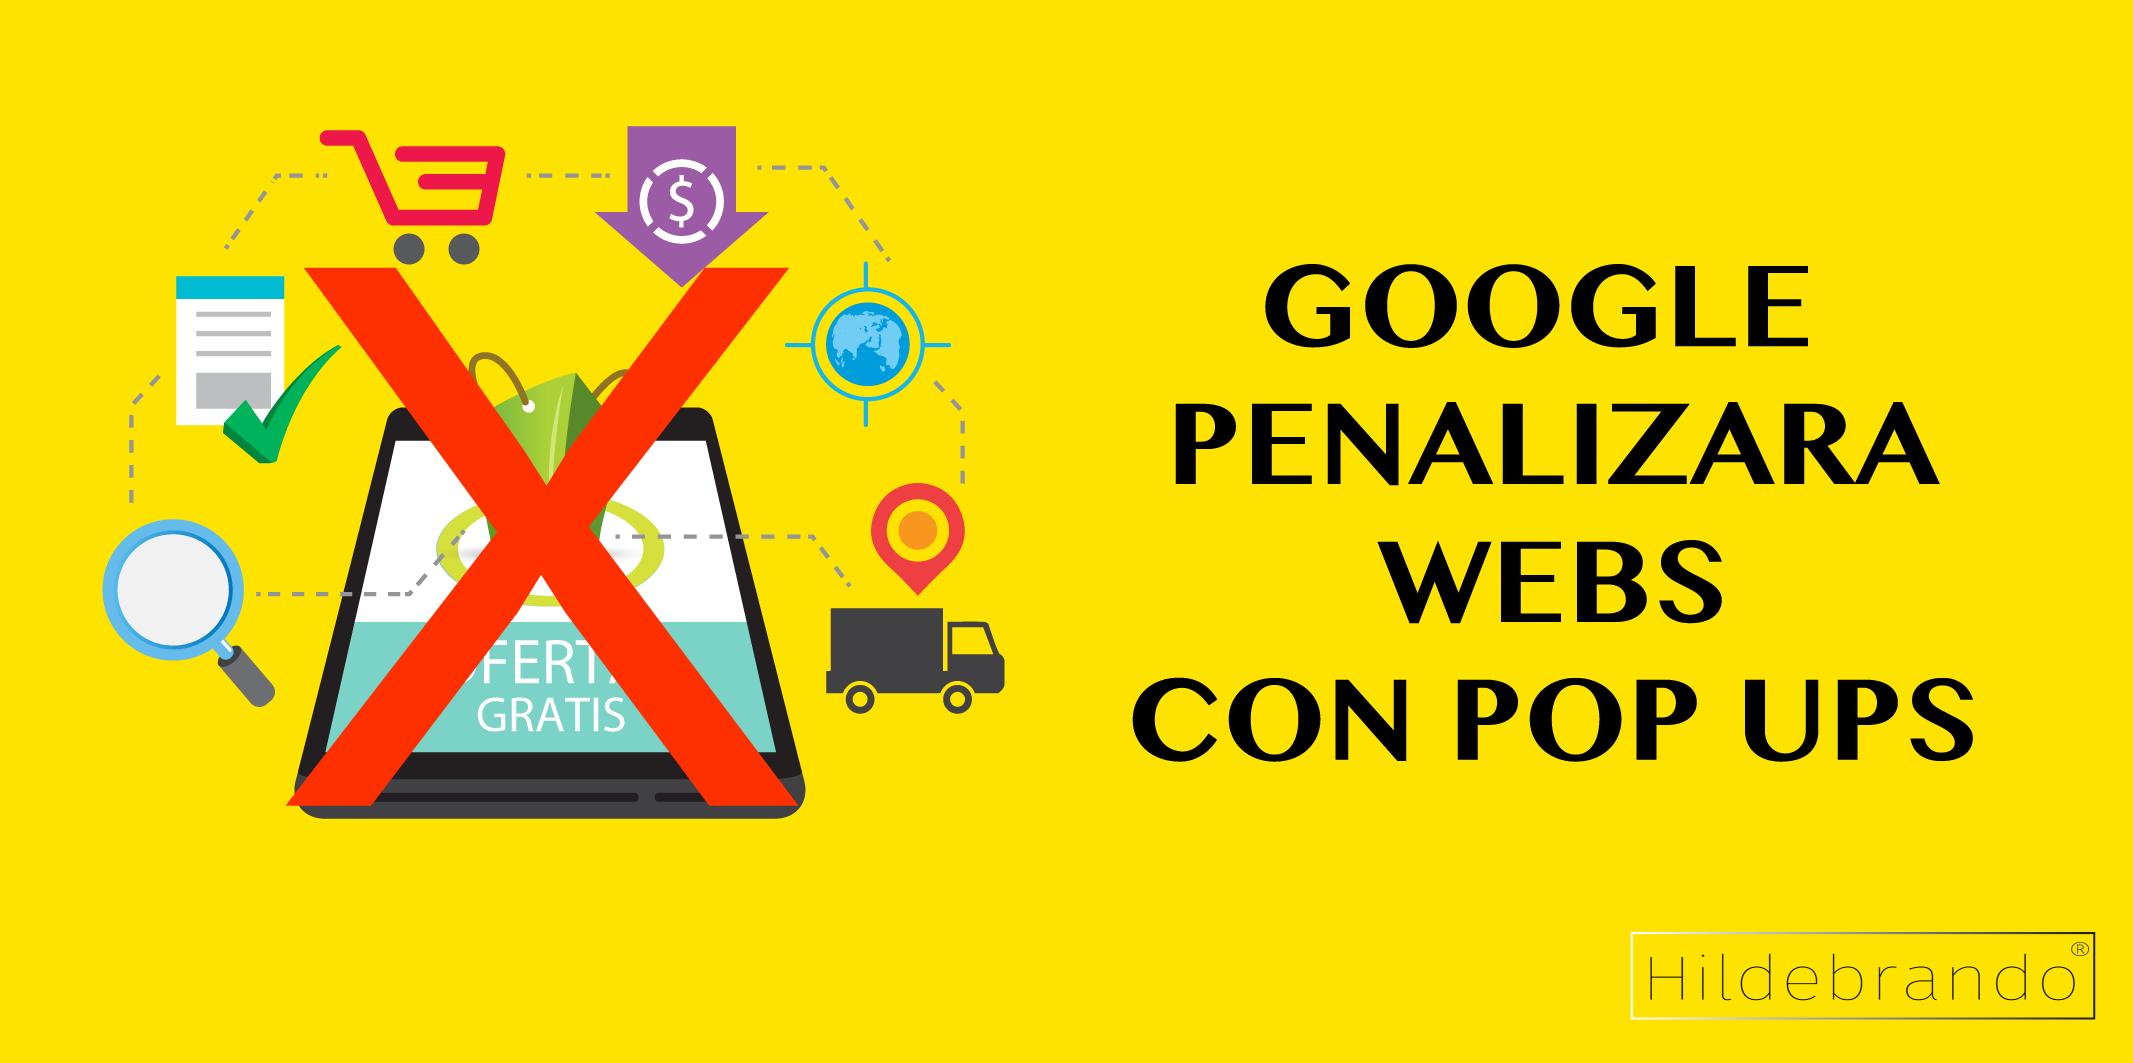 Google-penaliza-popups